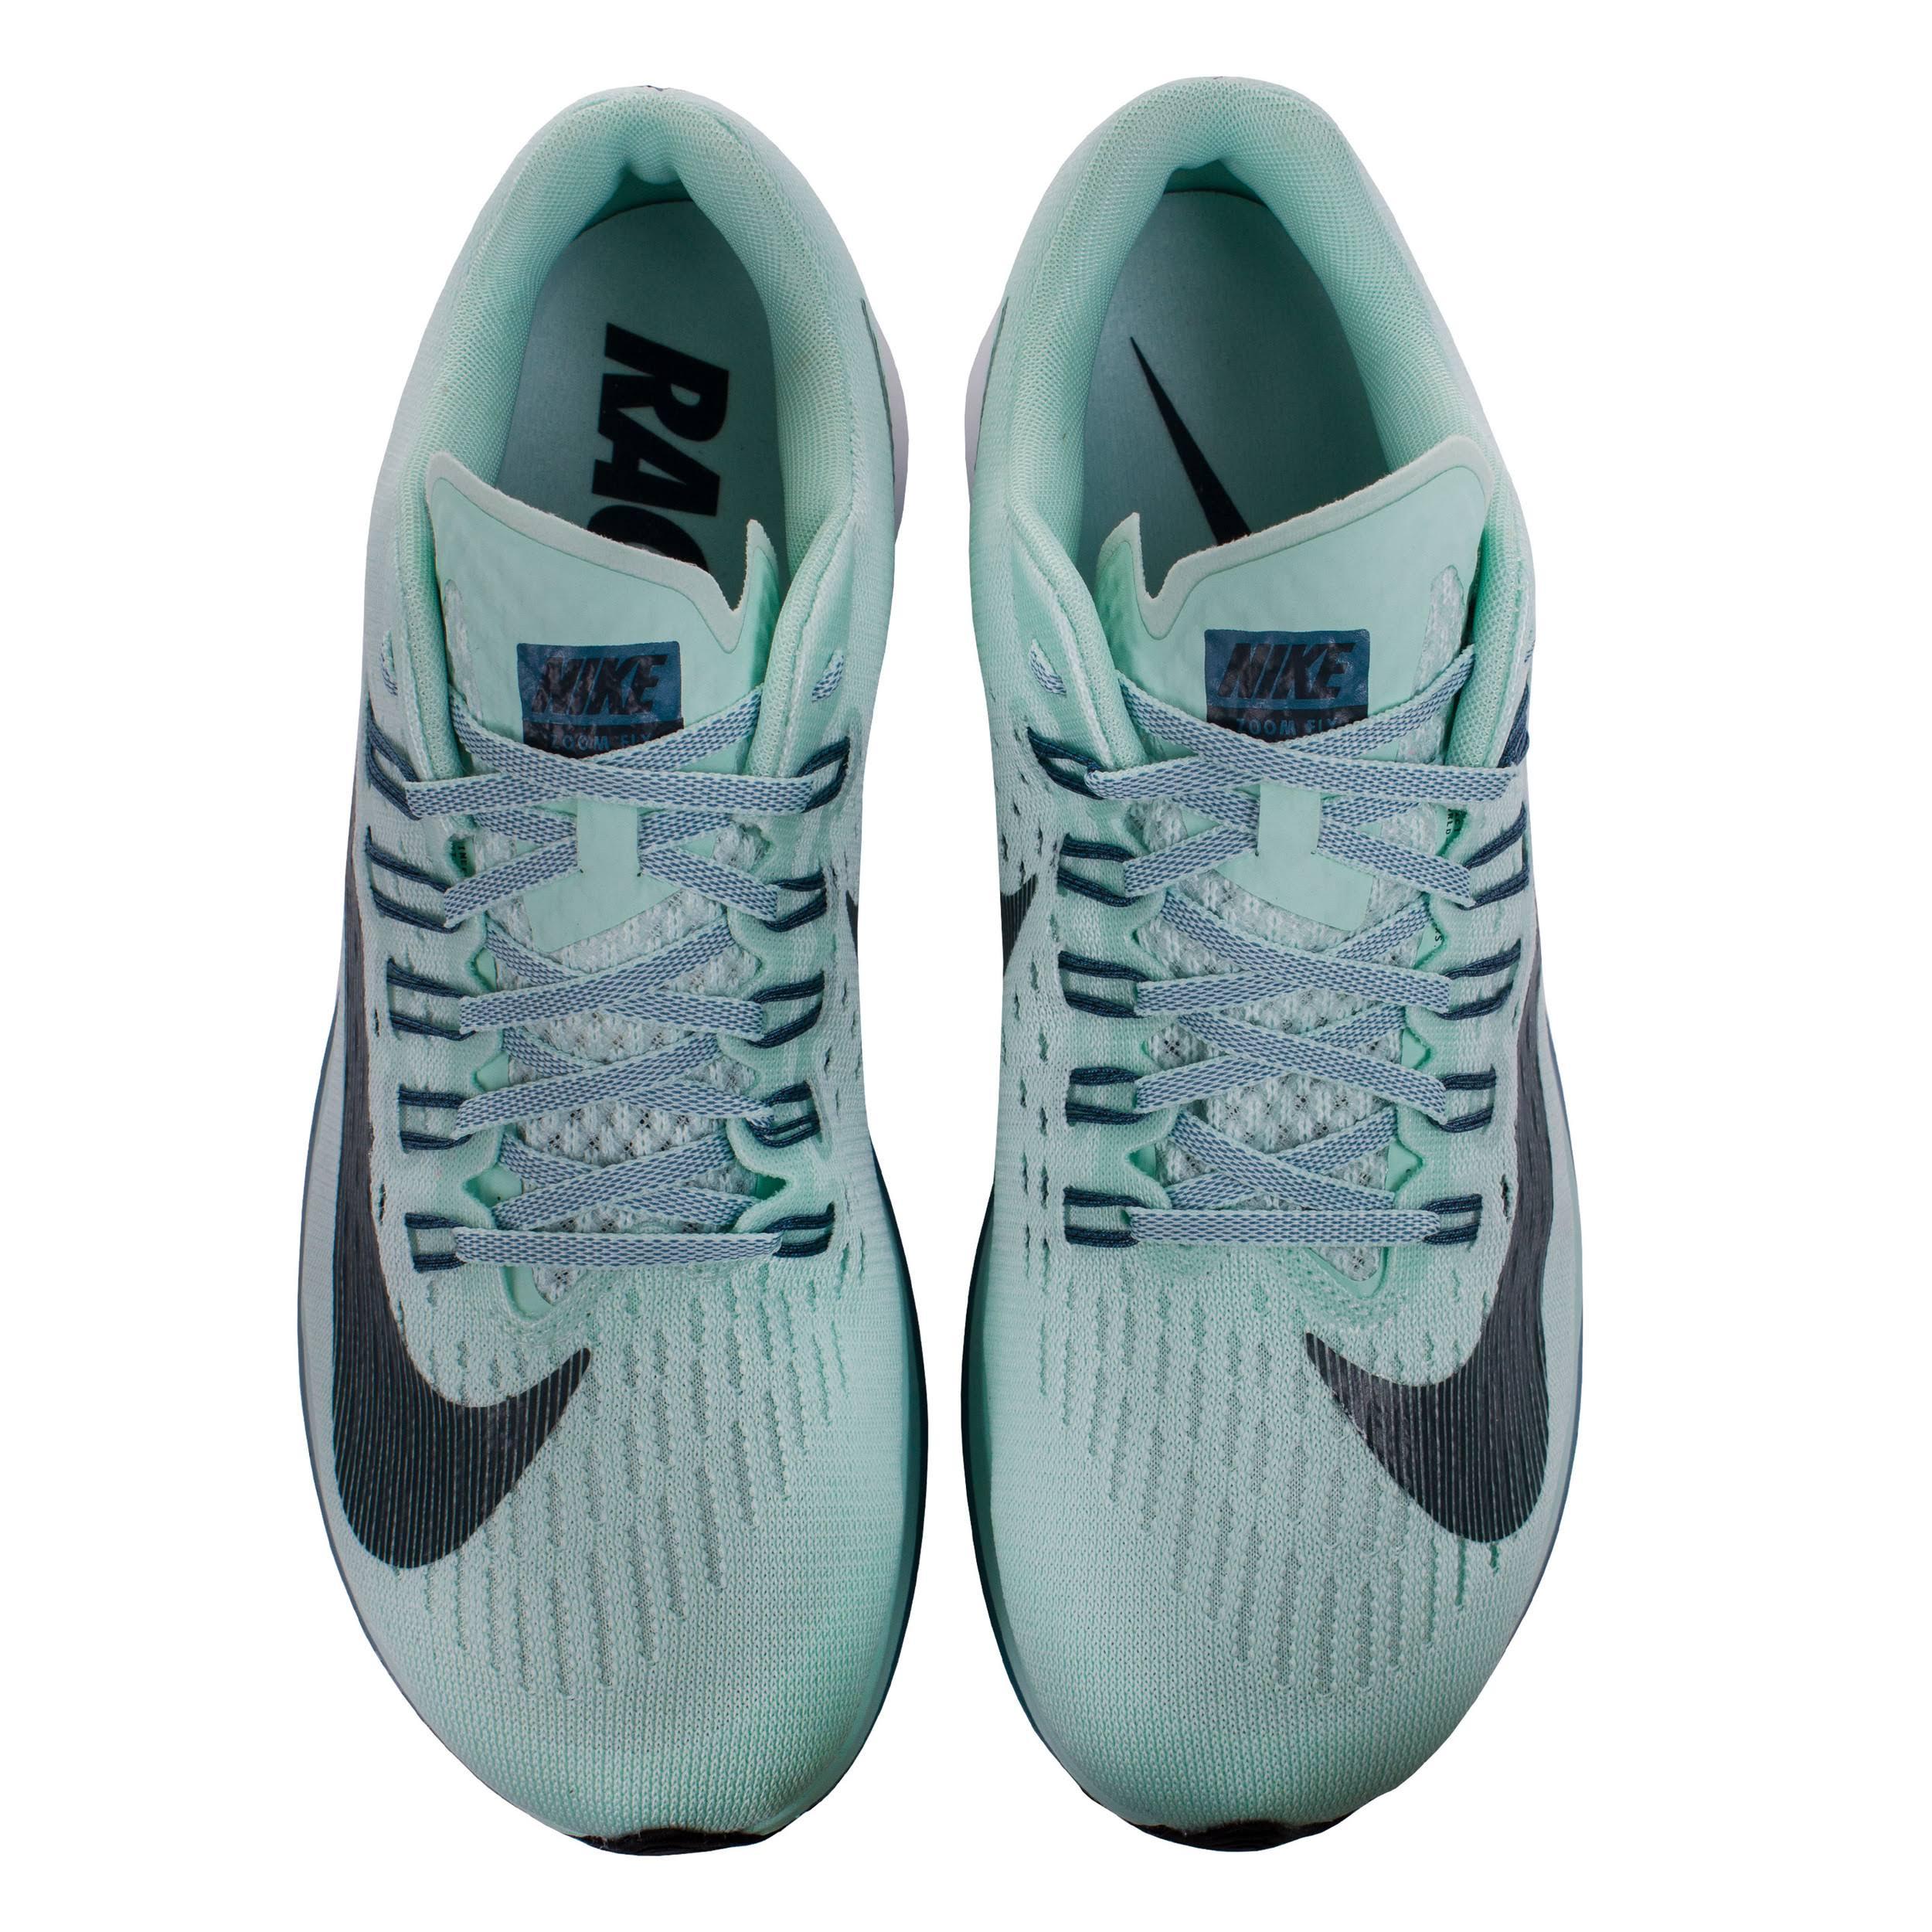 Größe Us Fly Zoom Türkis 8 Laufschuhe 40 5 Nike damen ICZxWF